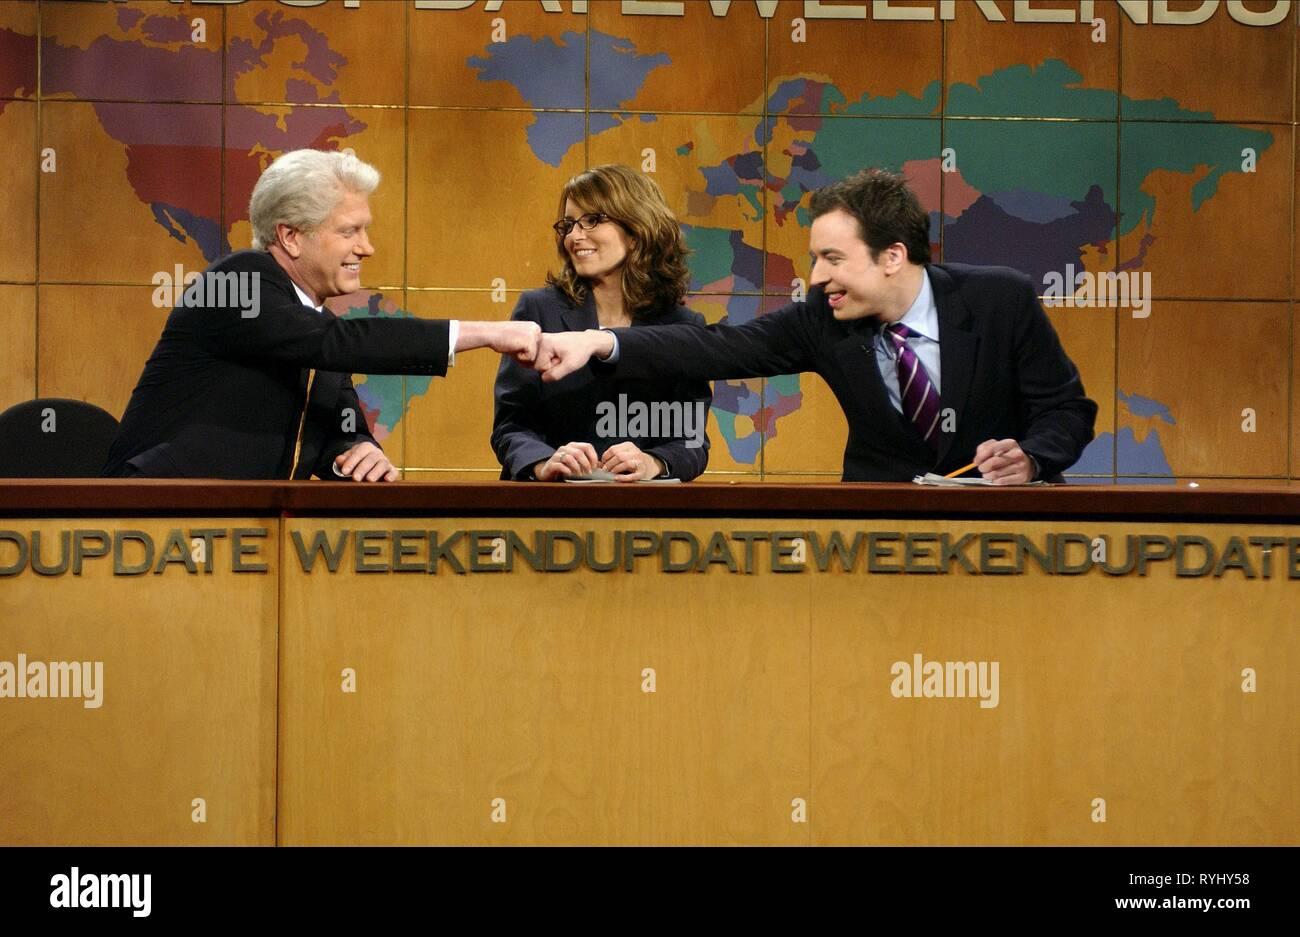 DARRELL HAMMOND (AS BILL CLINTON), TINA FEY, JIMMY FALLON, SATURDAY NIGHT LIVE, 2003 - Stock Image